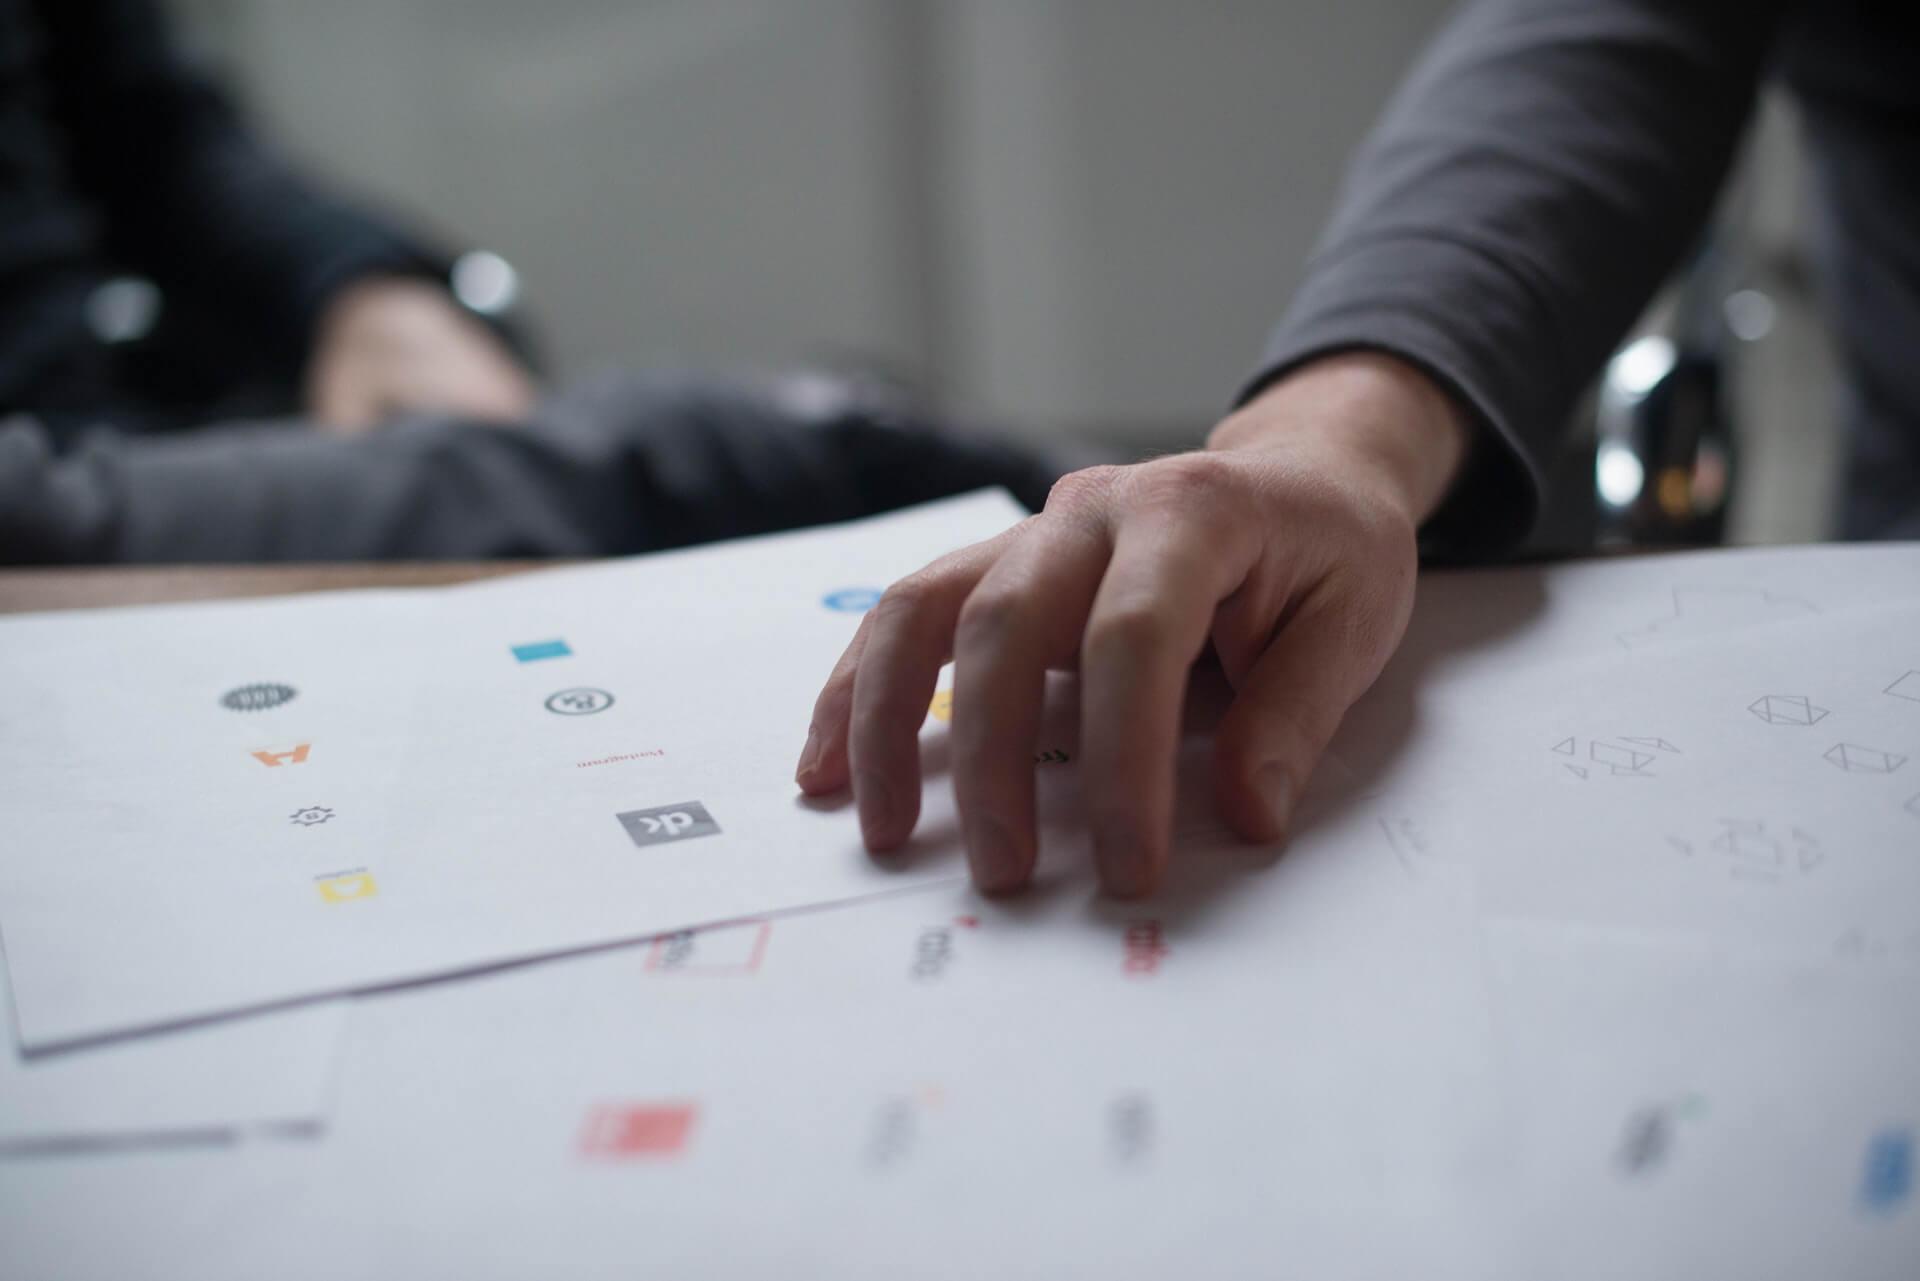 Designer Giving Critique